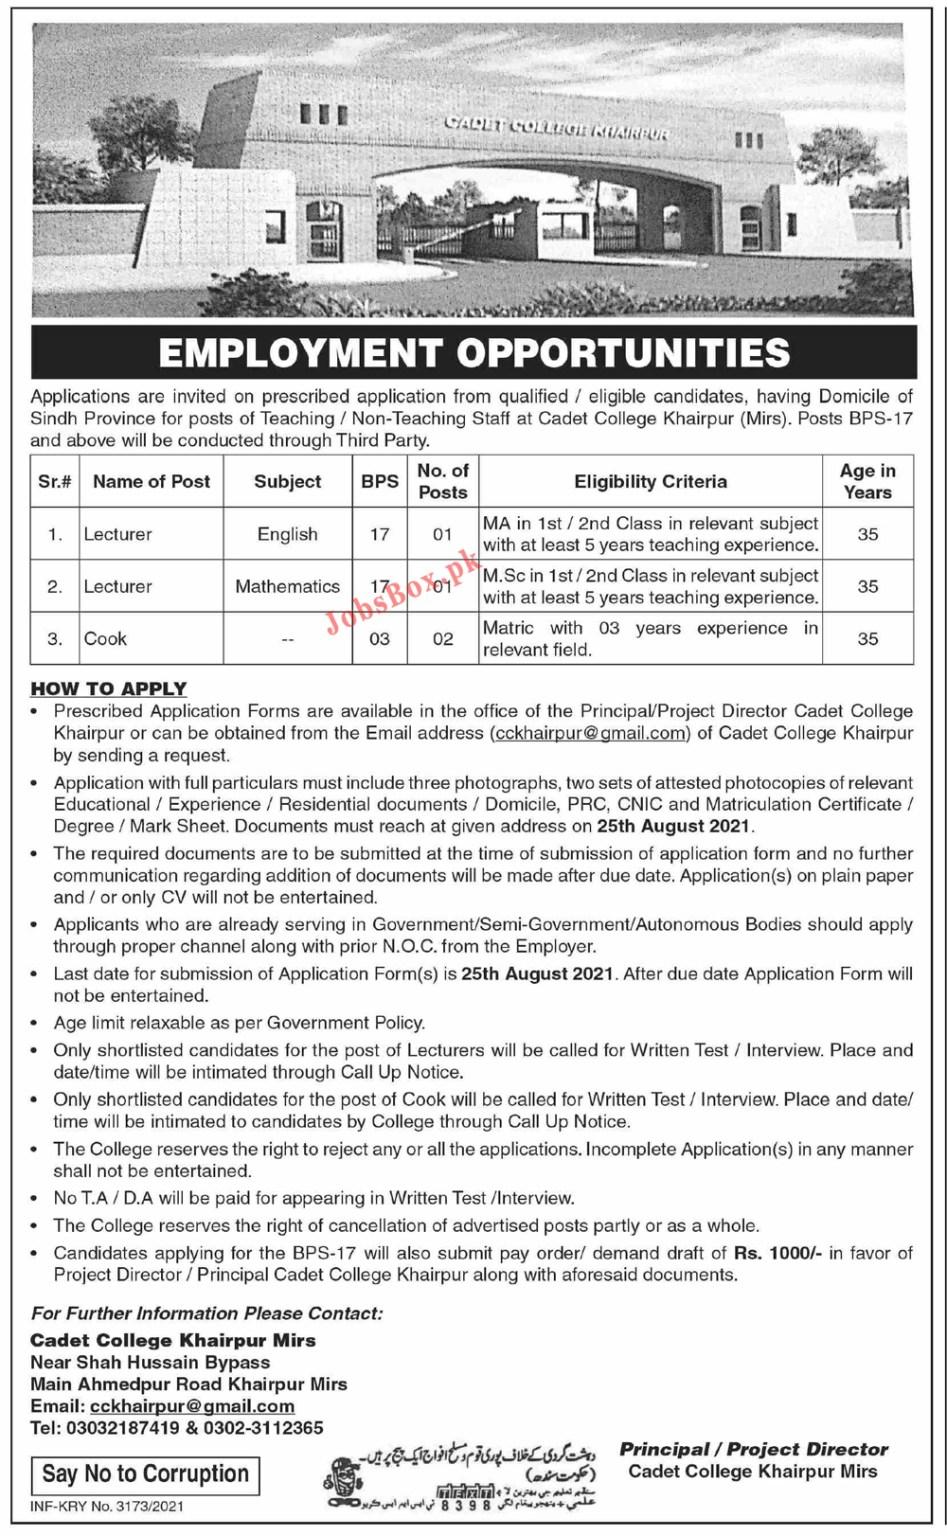 CCK Cadet College Khairpur Jobs 2021 in Pakistan